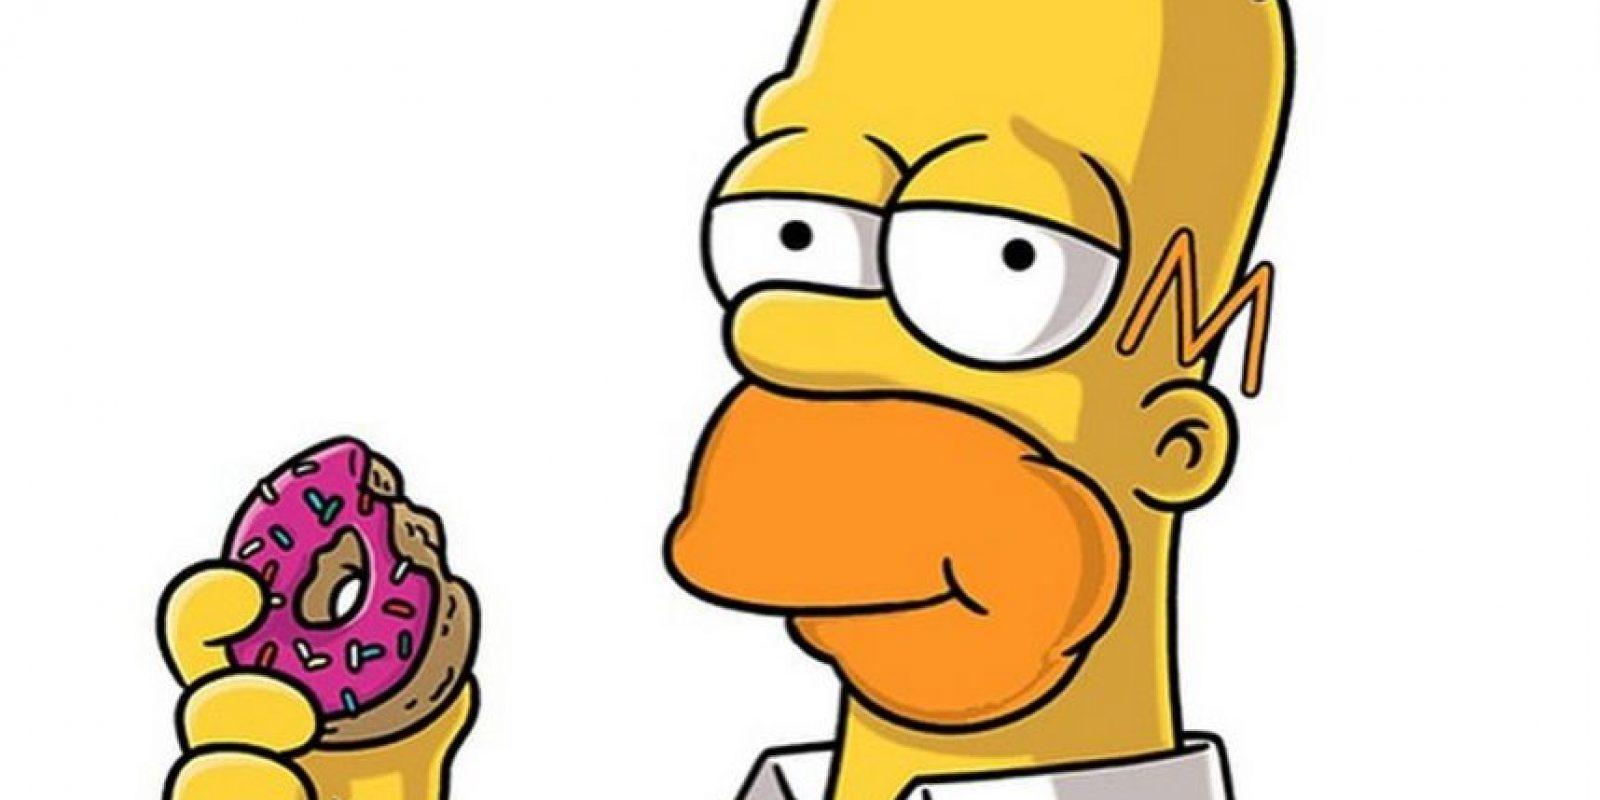 Homero Simpson Foto:Vía instagram.com/putarangonit/